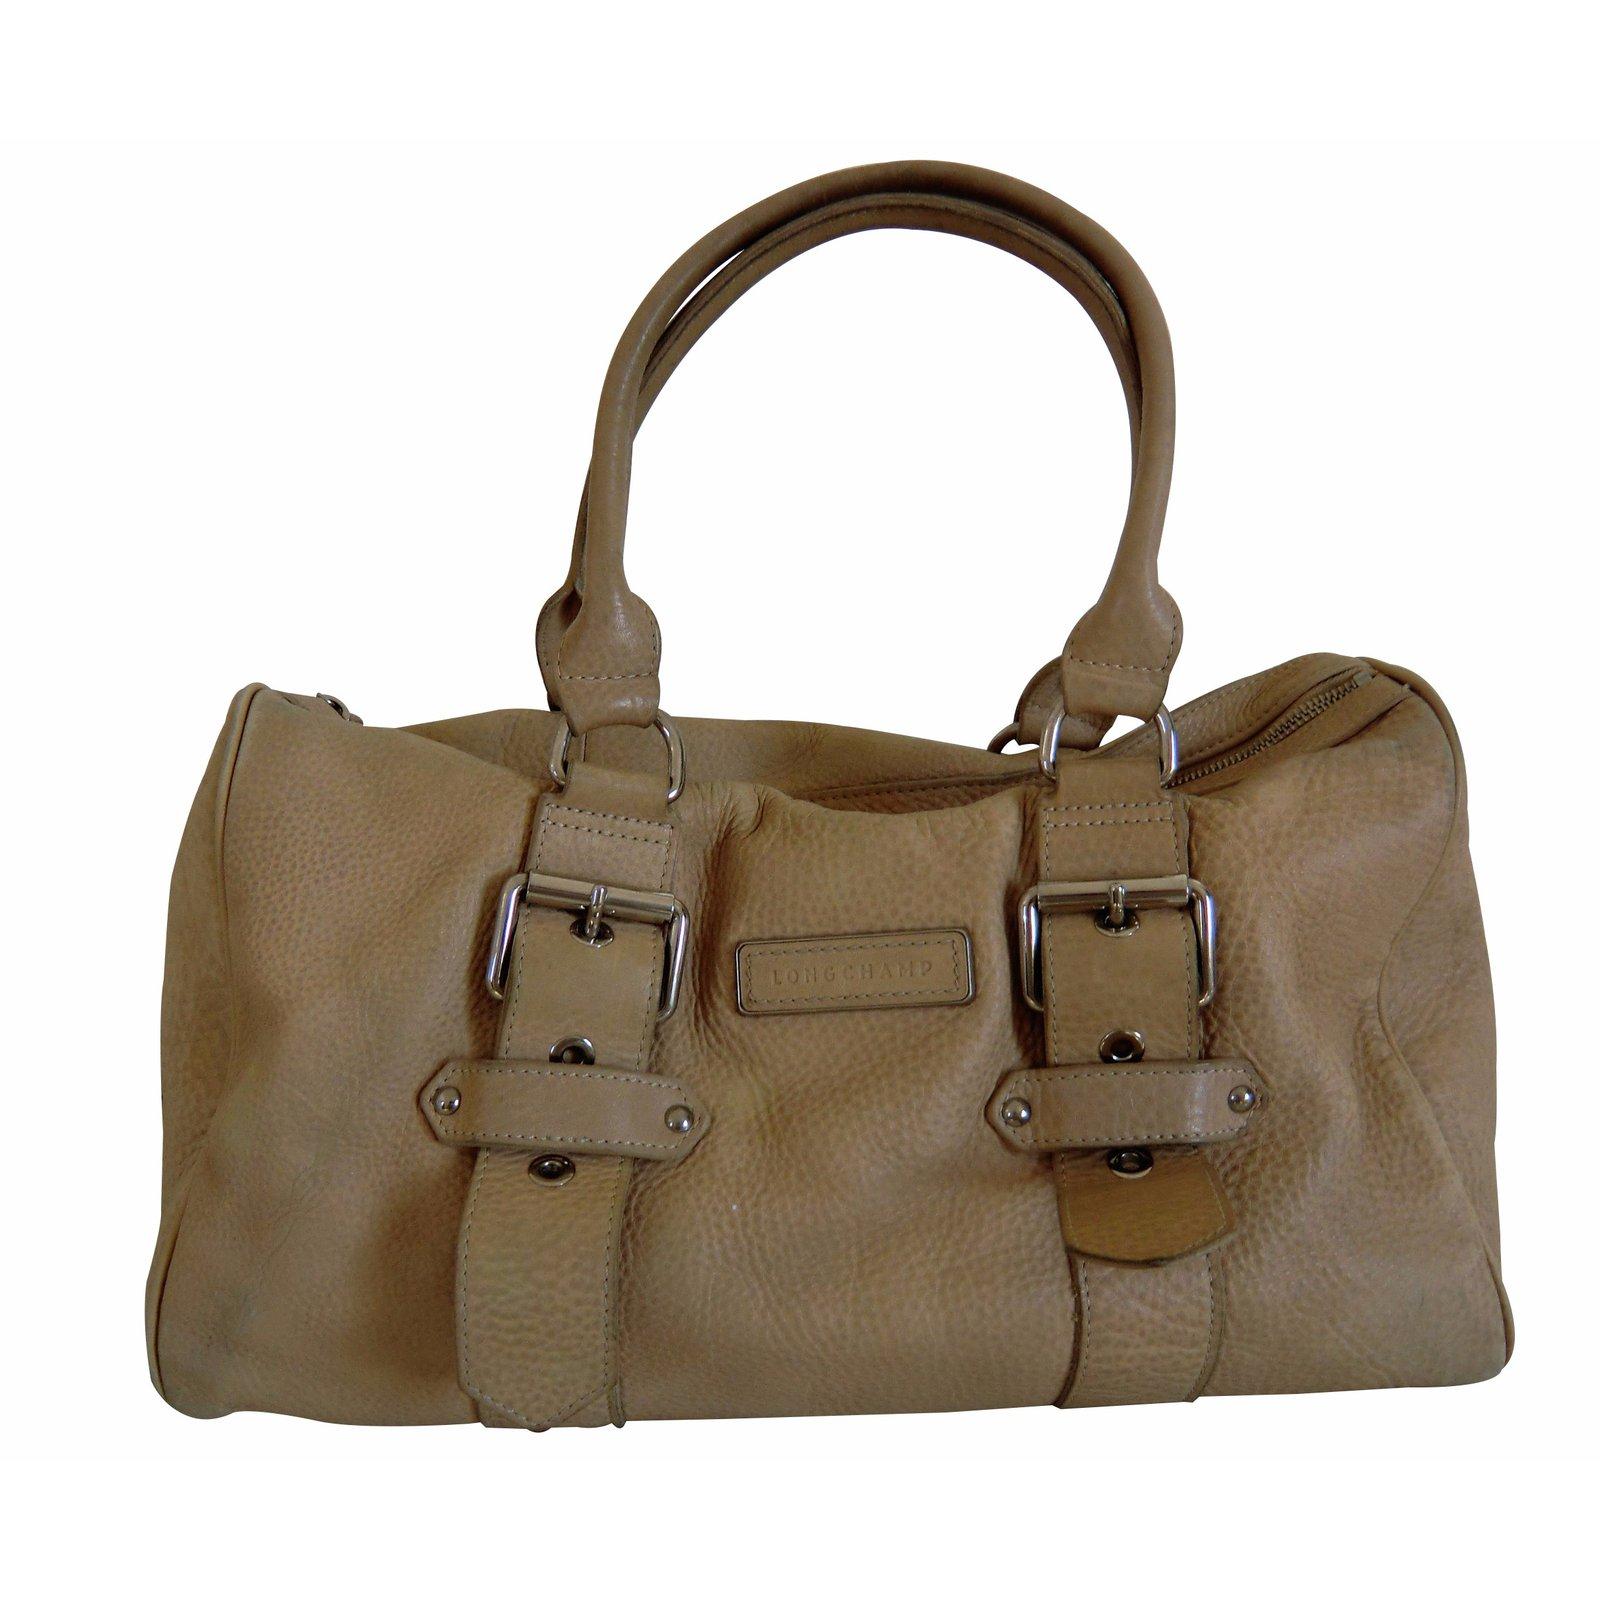 sacs main longchamp sacs main cuir beige joli closet. Black Bedroom Furniture Sets. Home Design Ideas